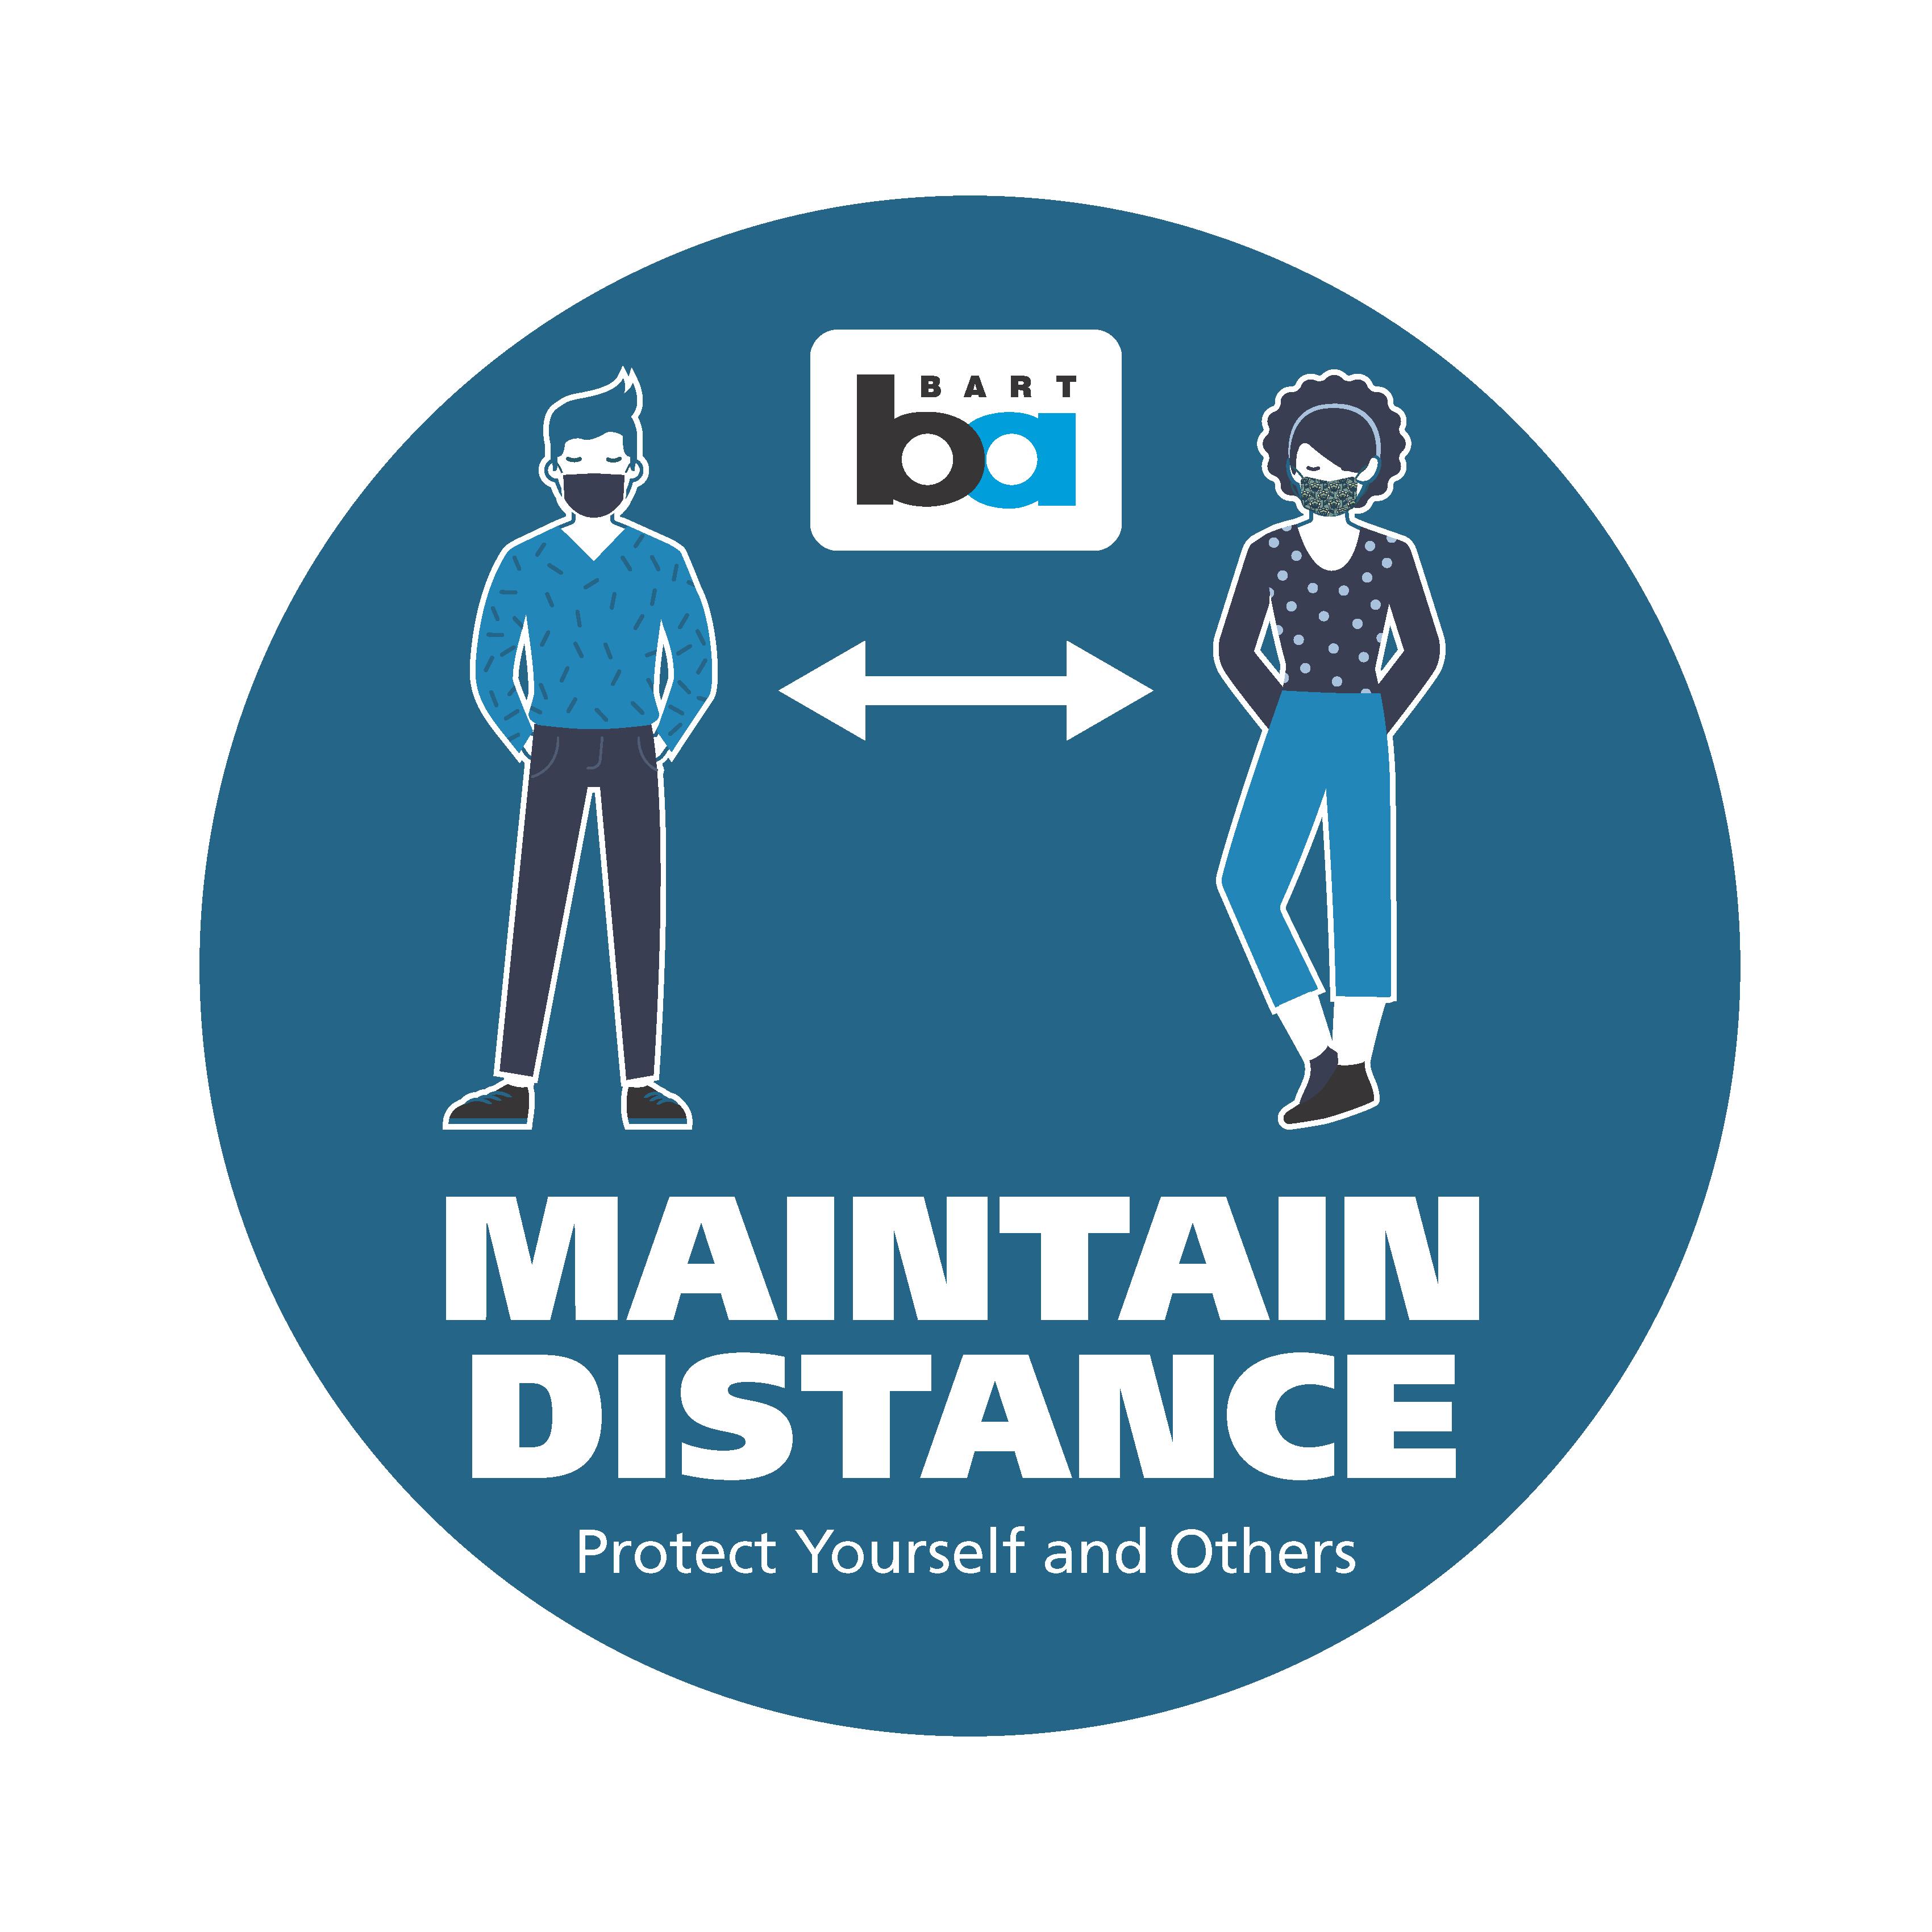 Bart distance logo